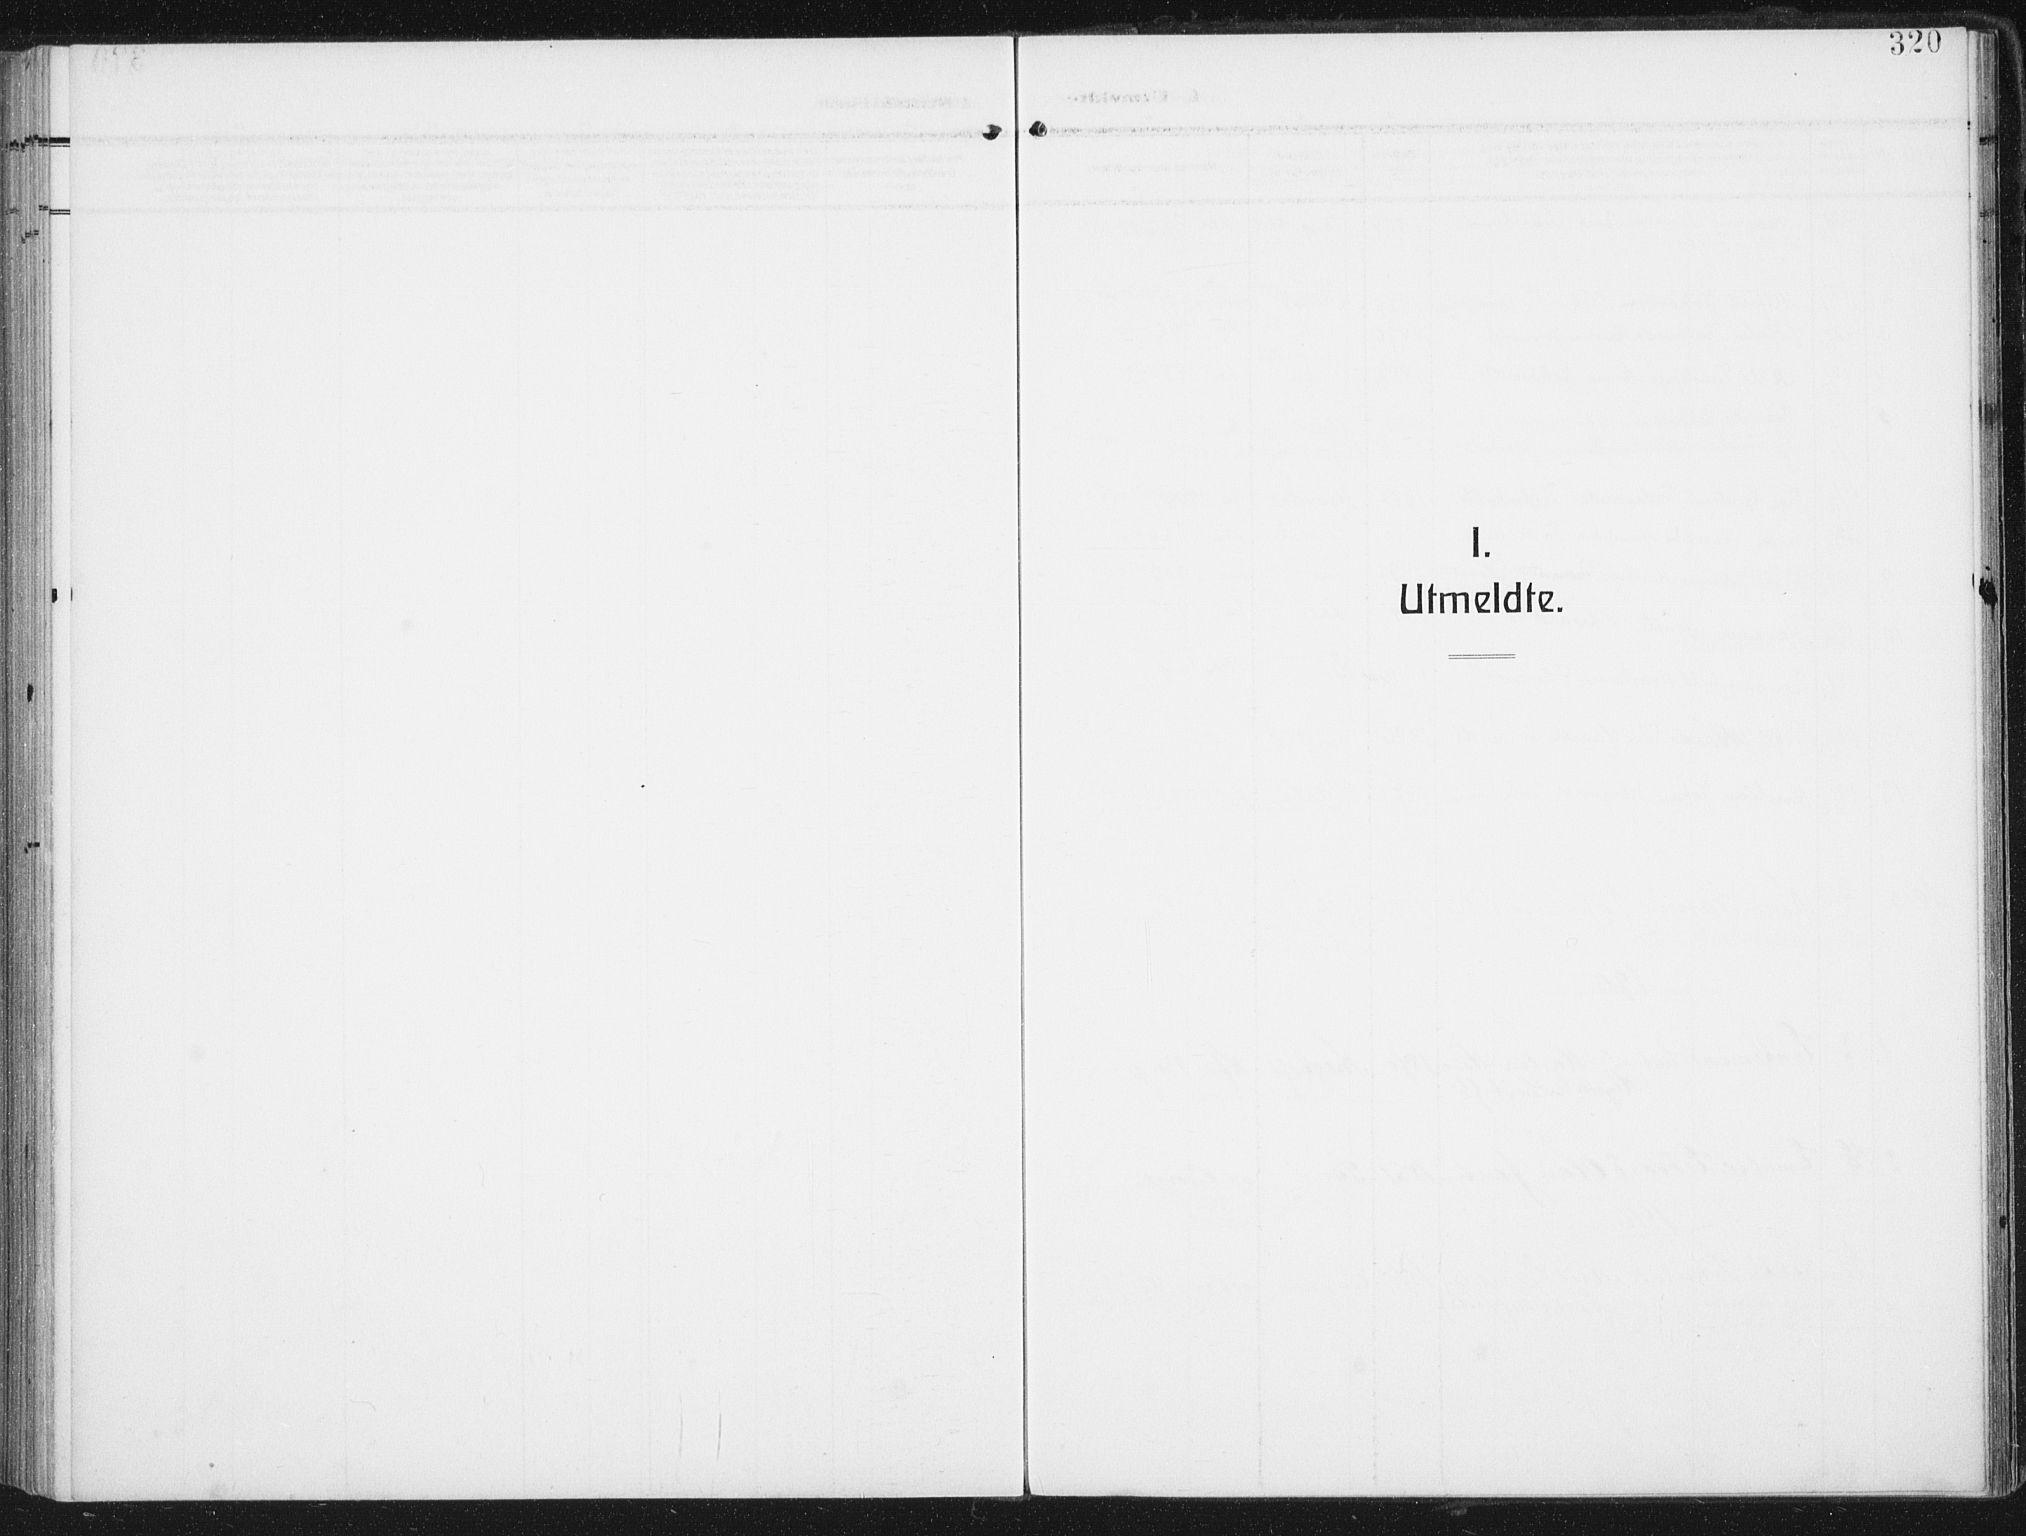 SAT, Ministerialprotokoller, klokkerbøker og fødselsregistre - Nordland, 880/L1135: Ministerialbok nr. 880A09, 1908-1919, s. 320